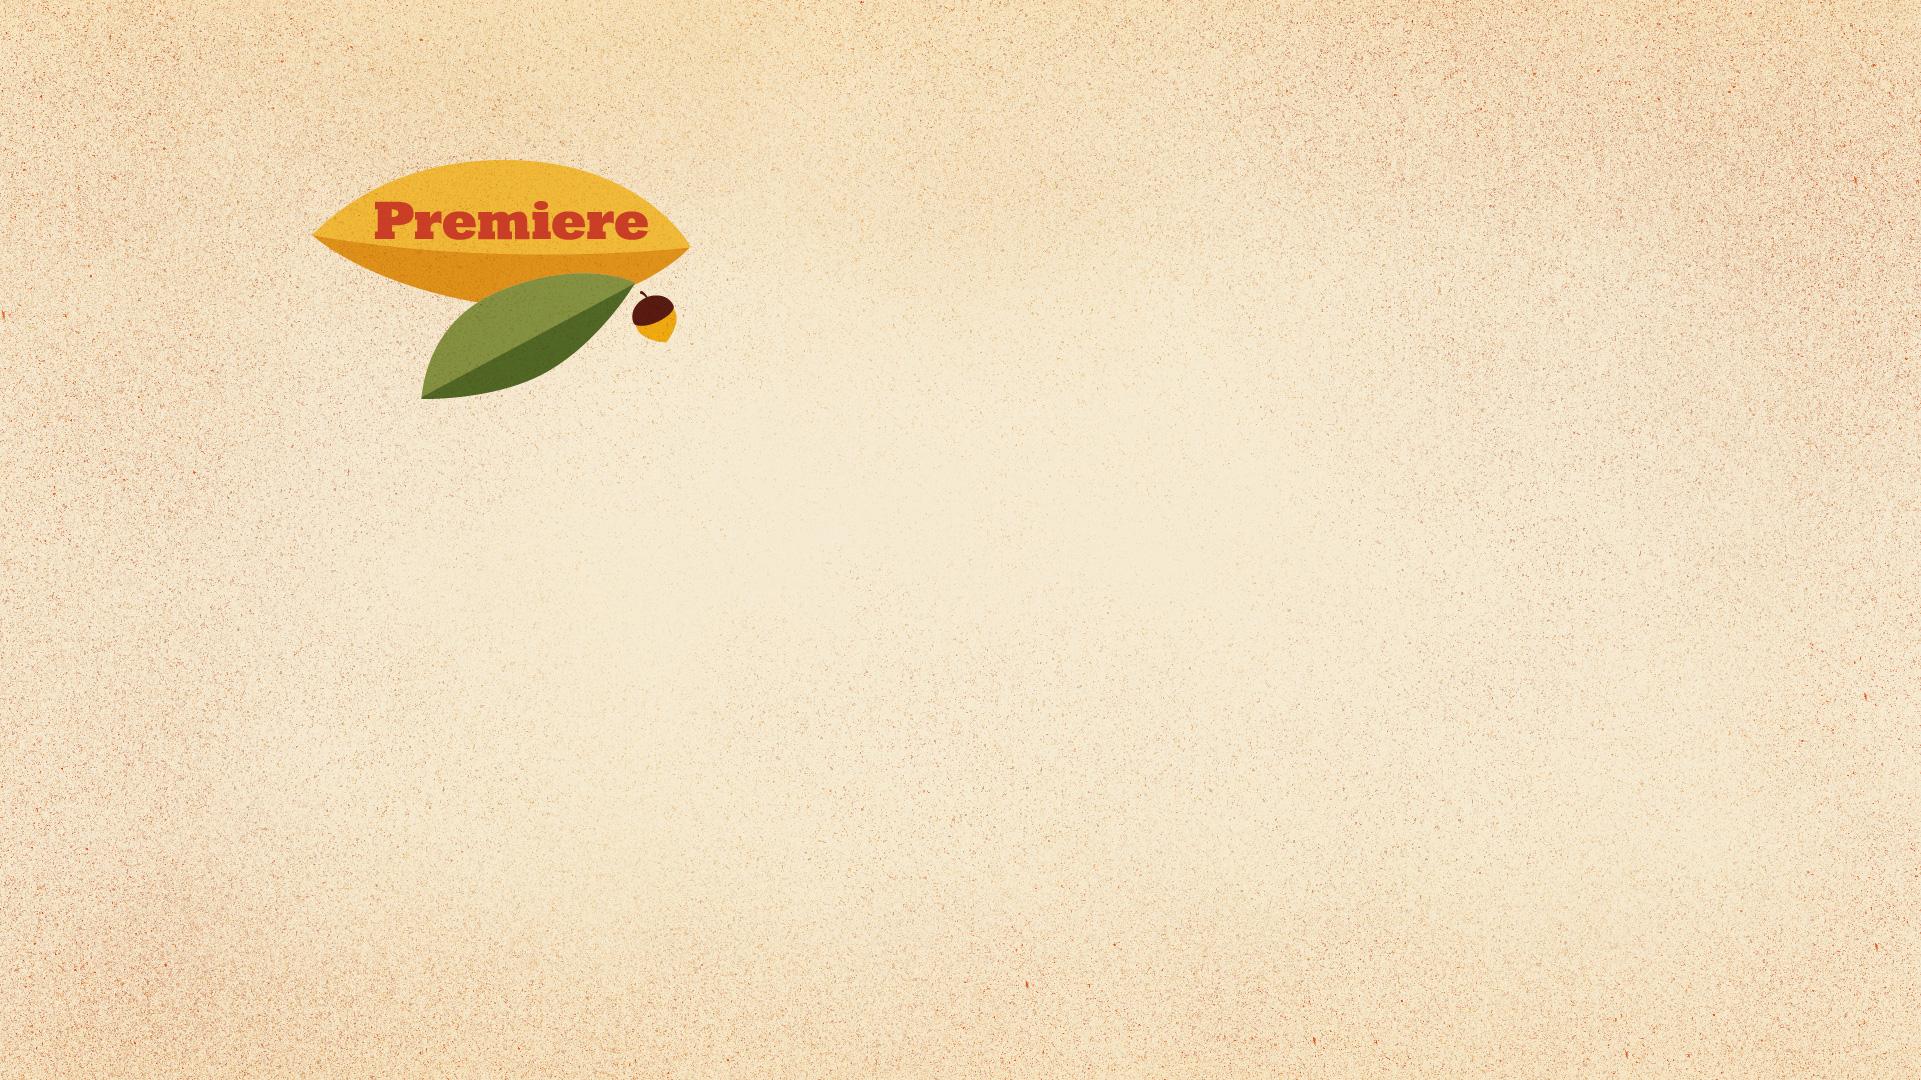 Gobble Gobble Guppies_Premiere2-01.jpg